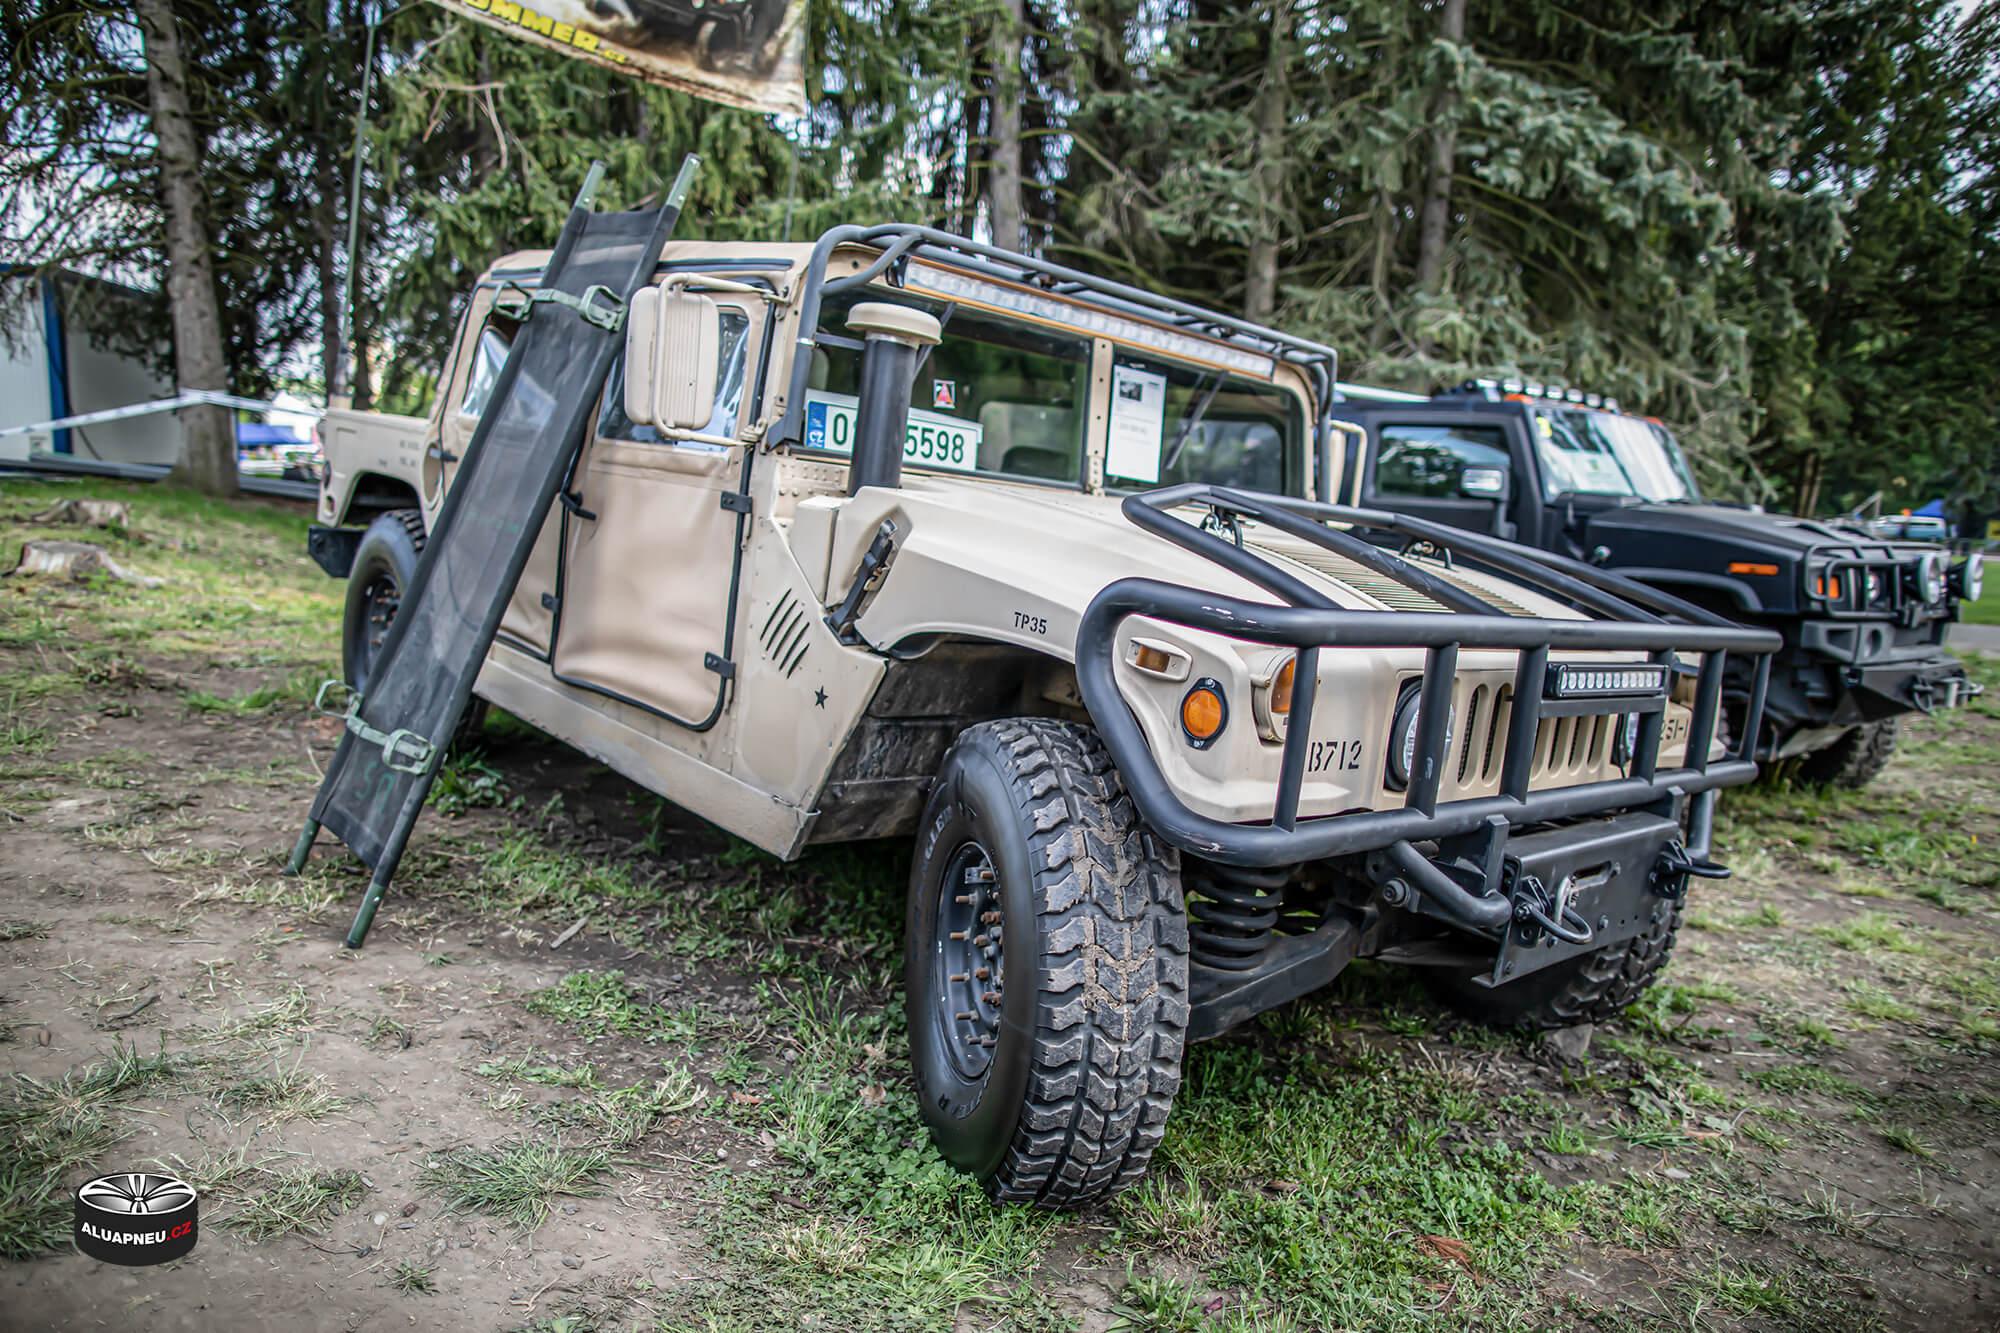 Hummer H1 - Automobilové Legendy 2019 - www.aluapneu.cz